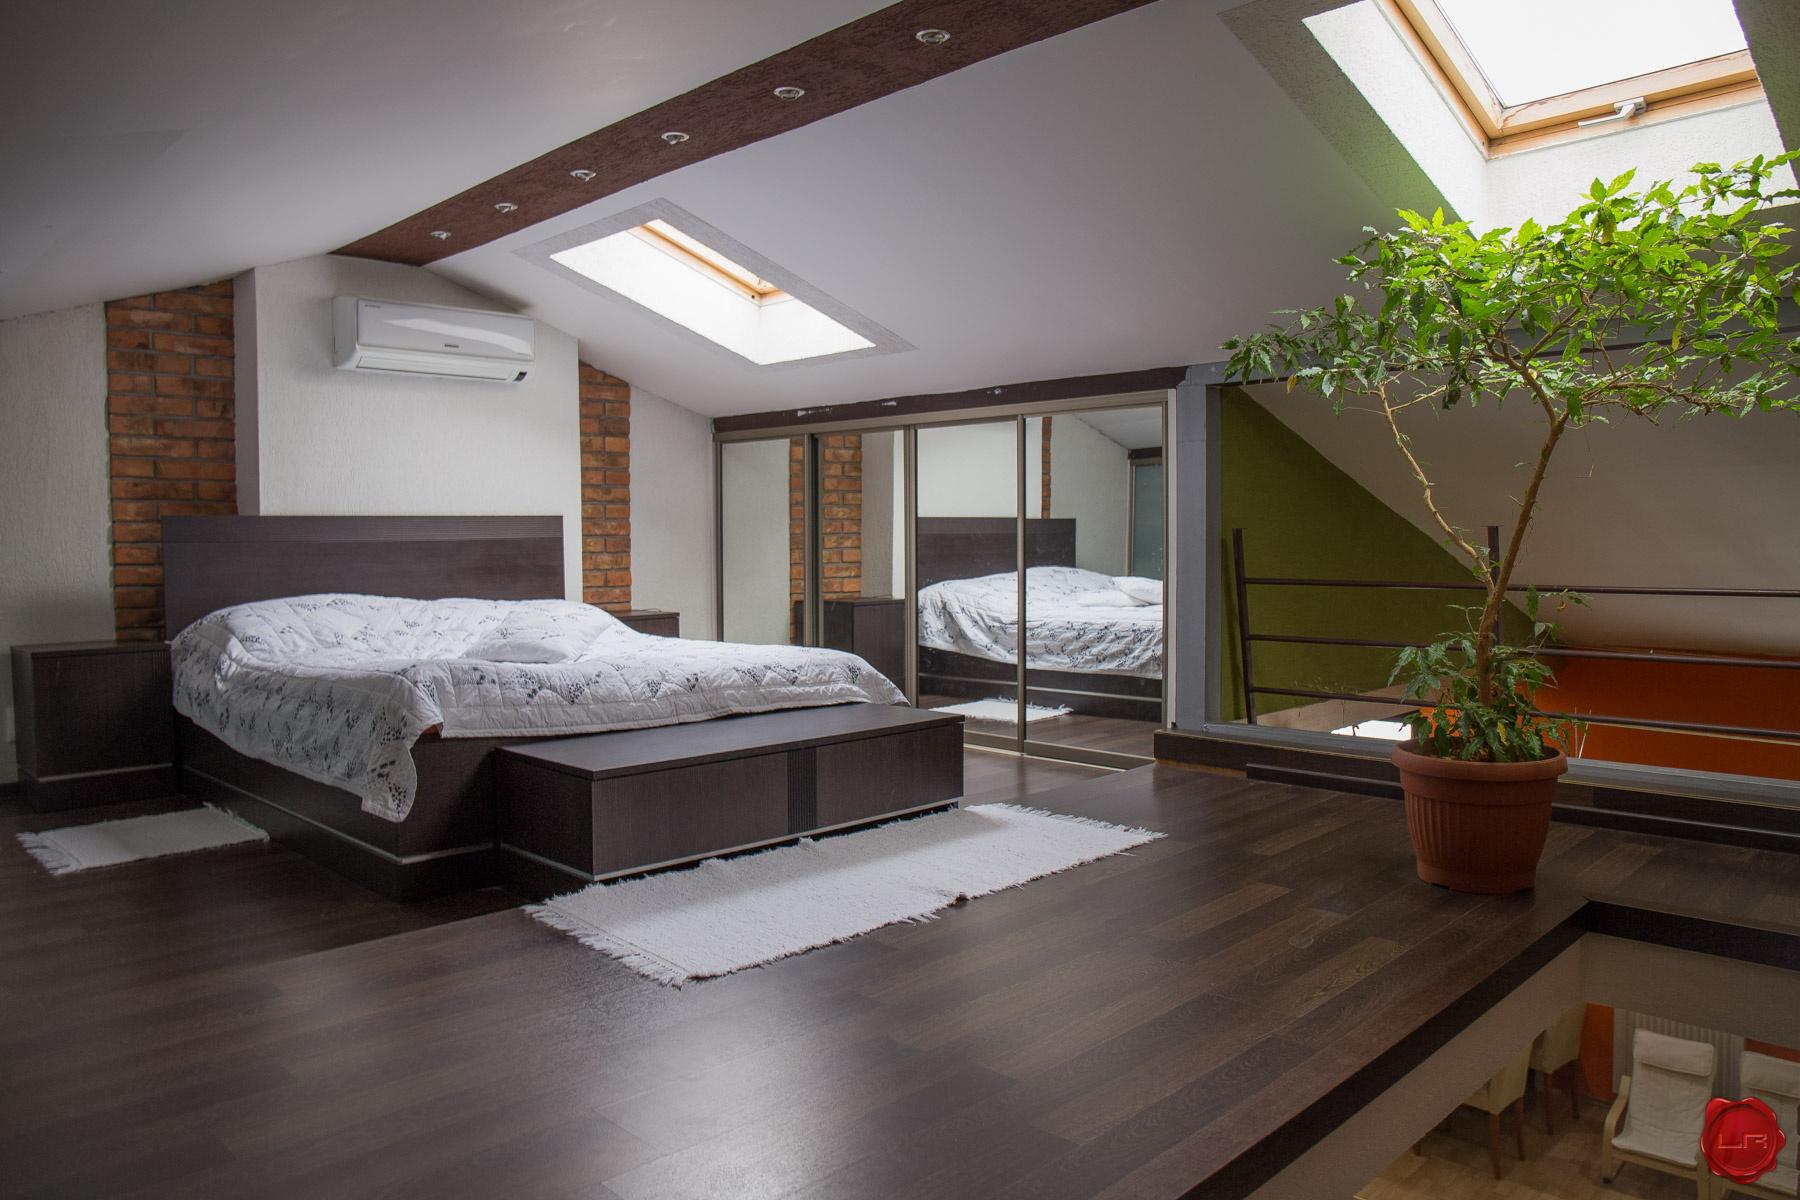 Moderný podkrovný byt 3+1 s loggiou, centrum Sp. Nová Ves